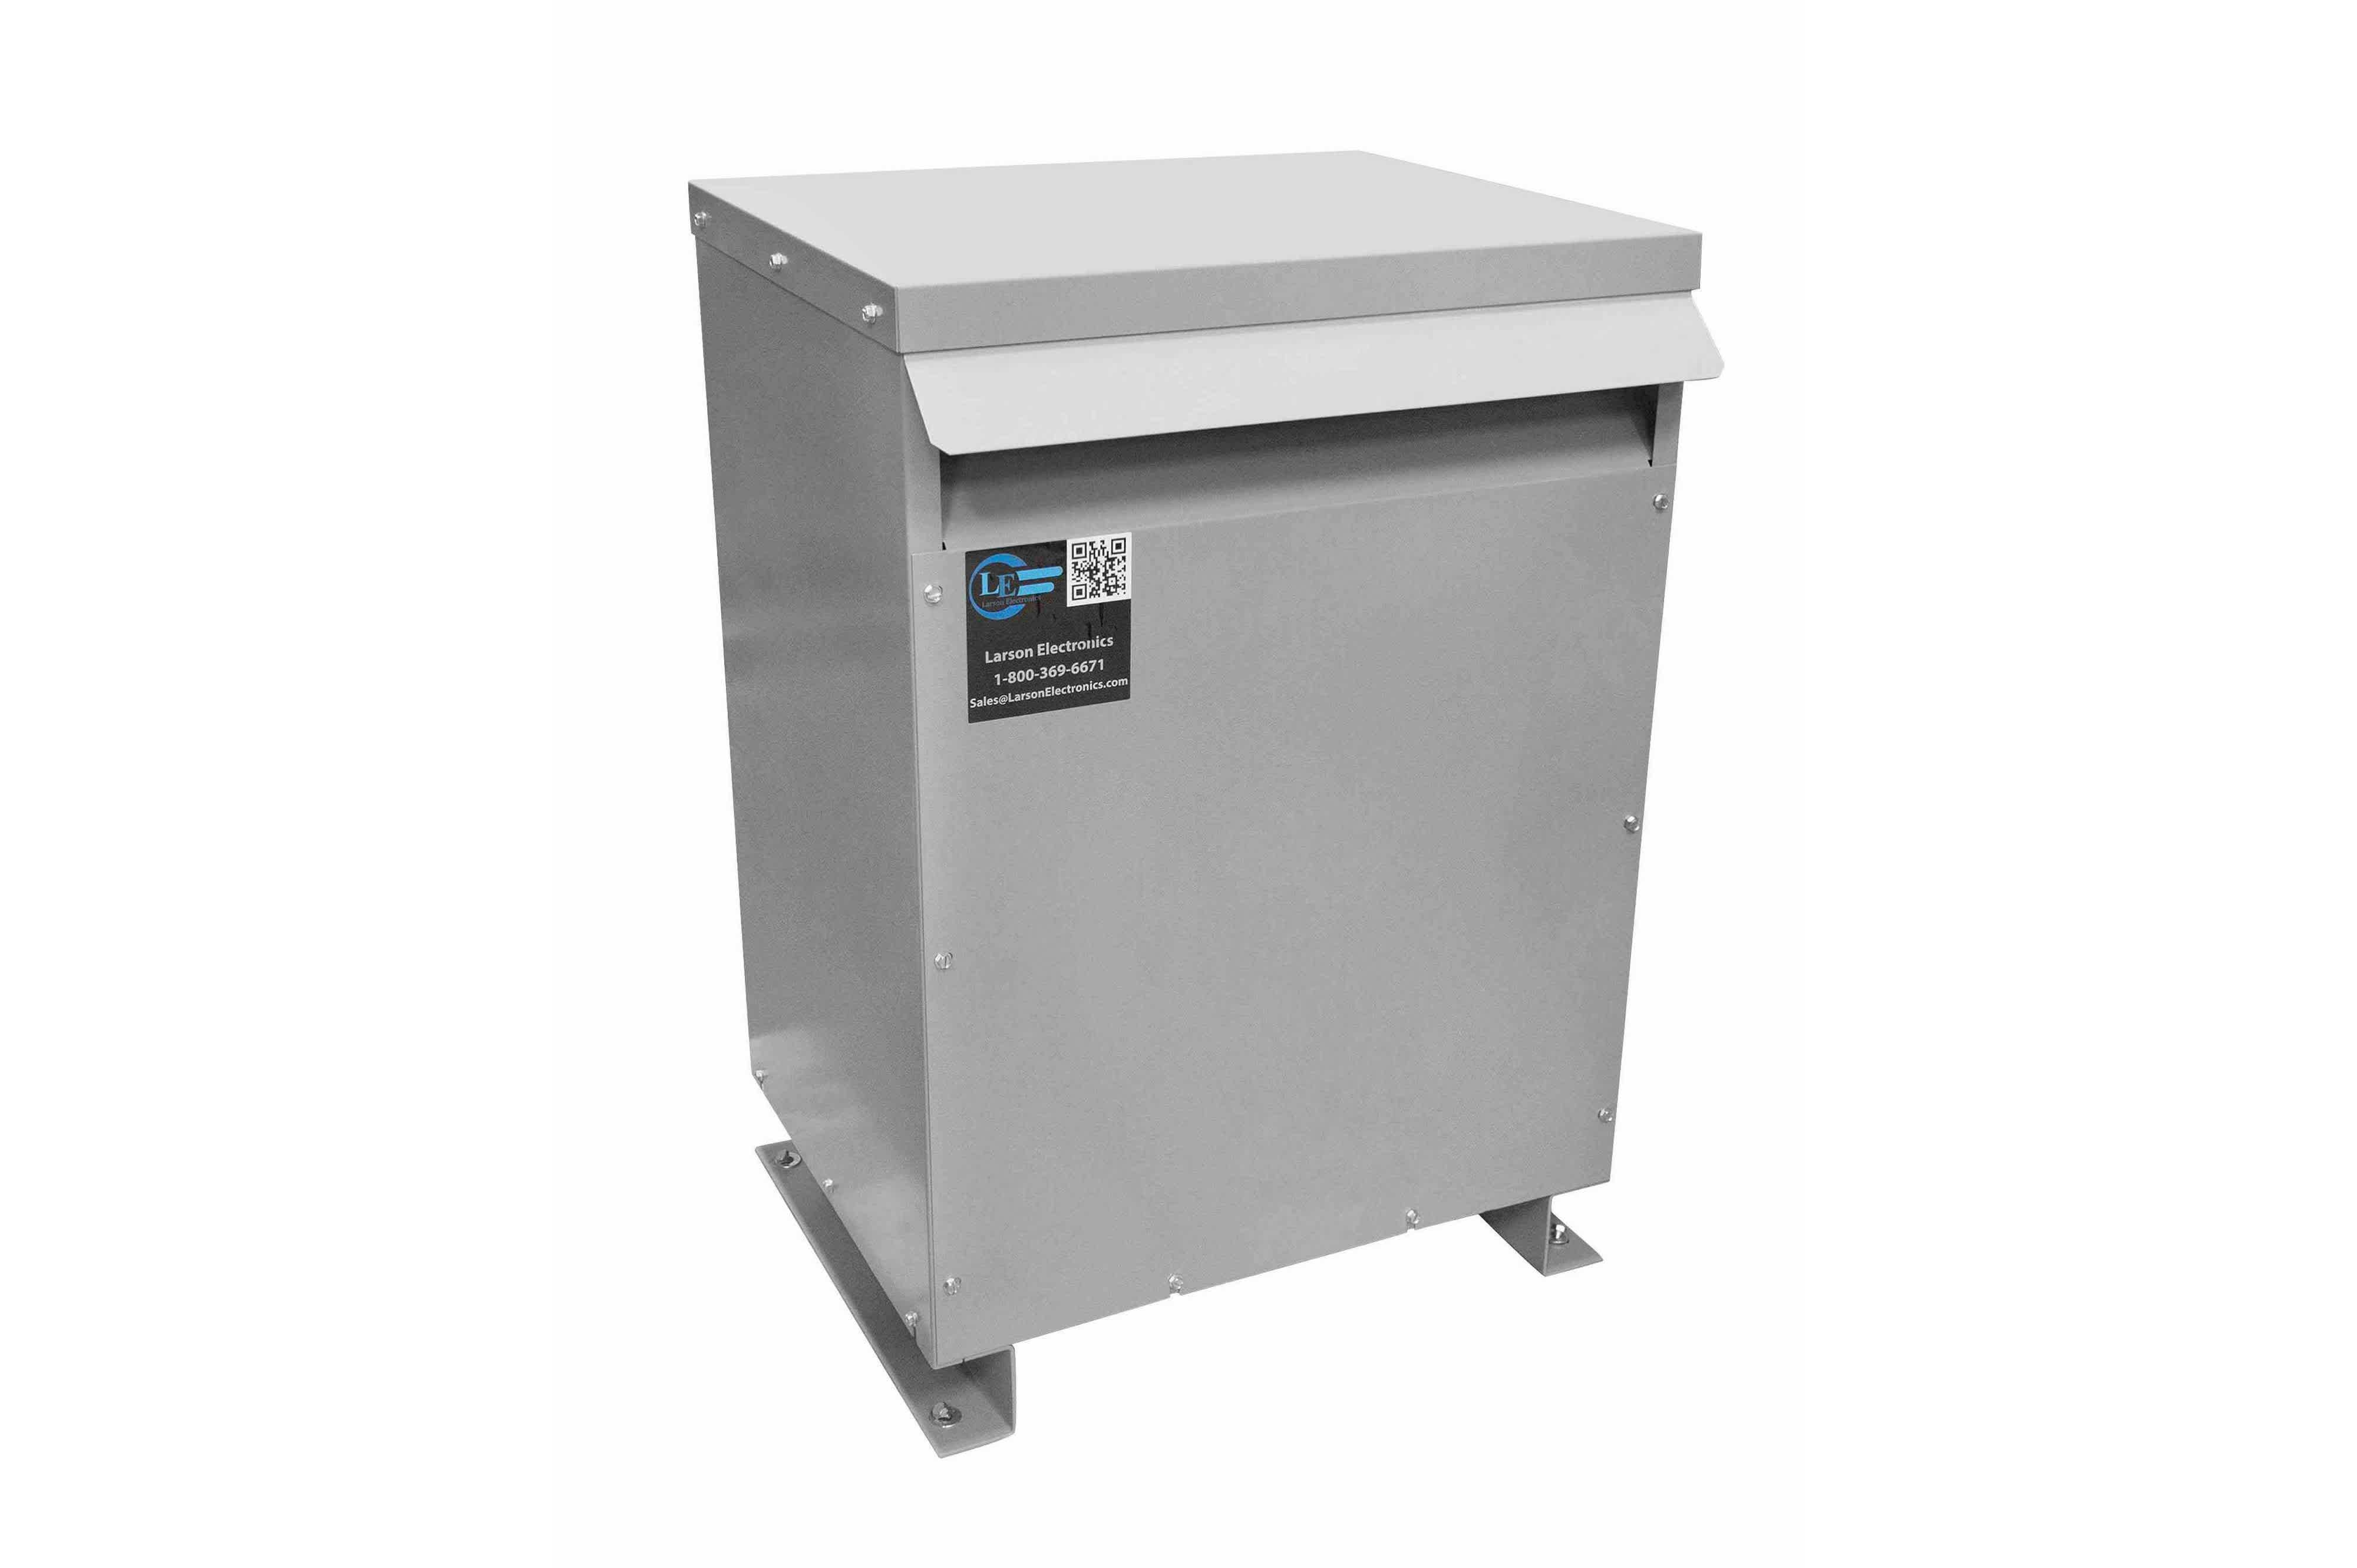 400 kVA 3PH Isolation Transformer, 460V Wye Primary, 400Y/231 Wye-N Secondary, N3R, Ventilated, 60 Hz